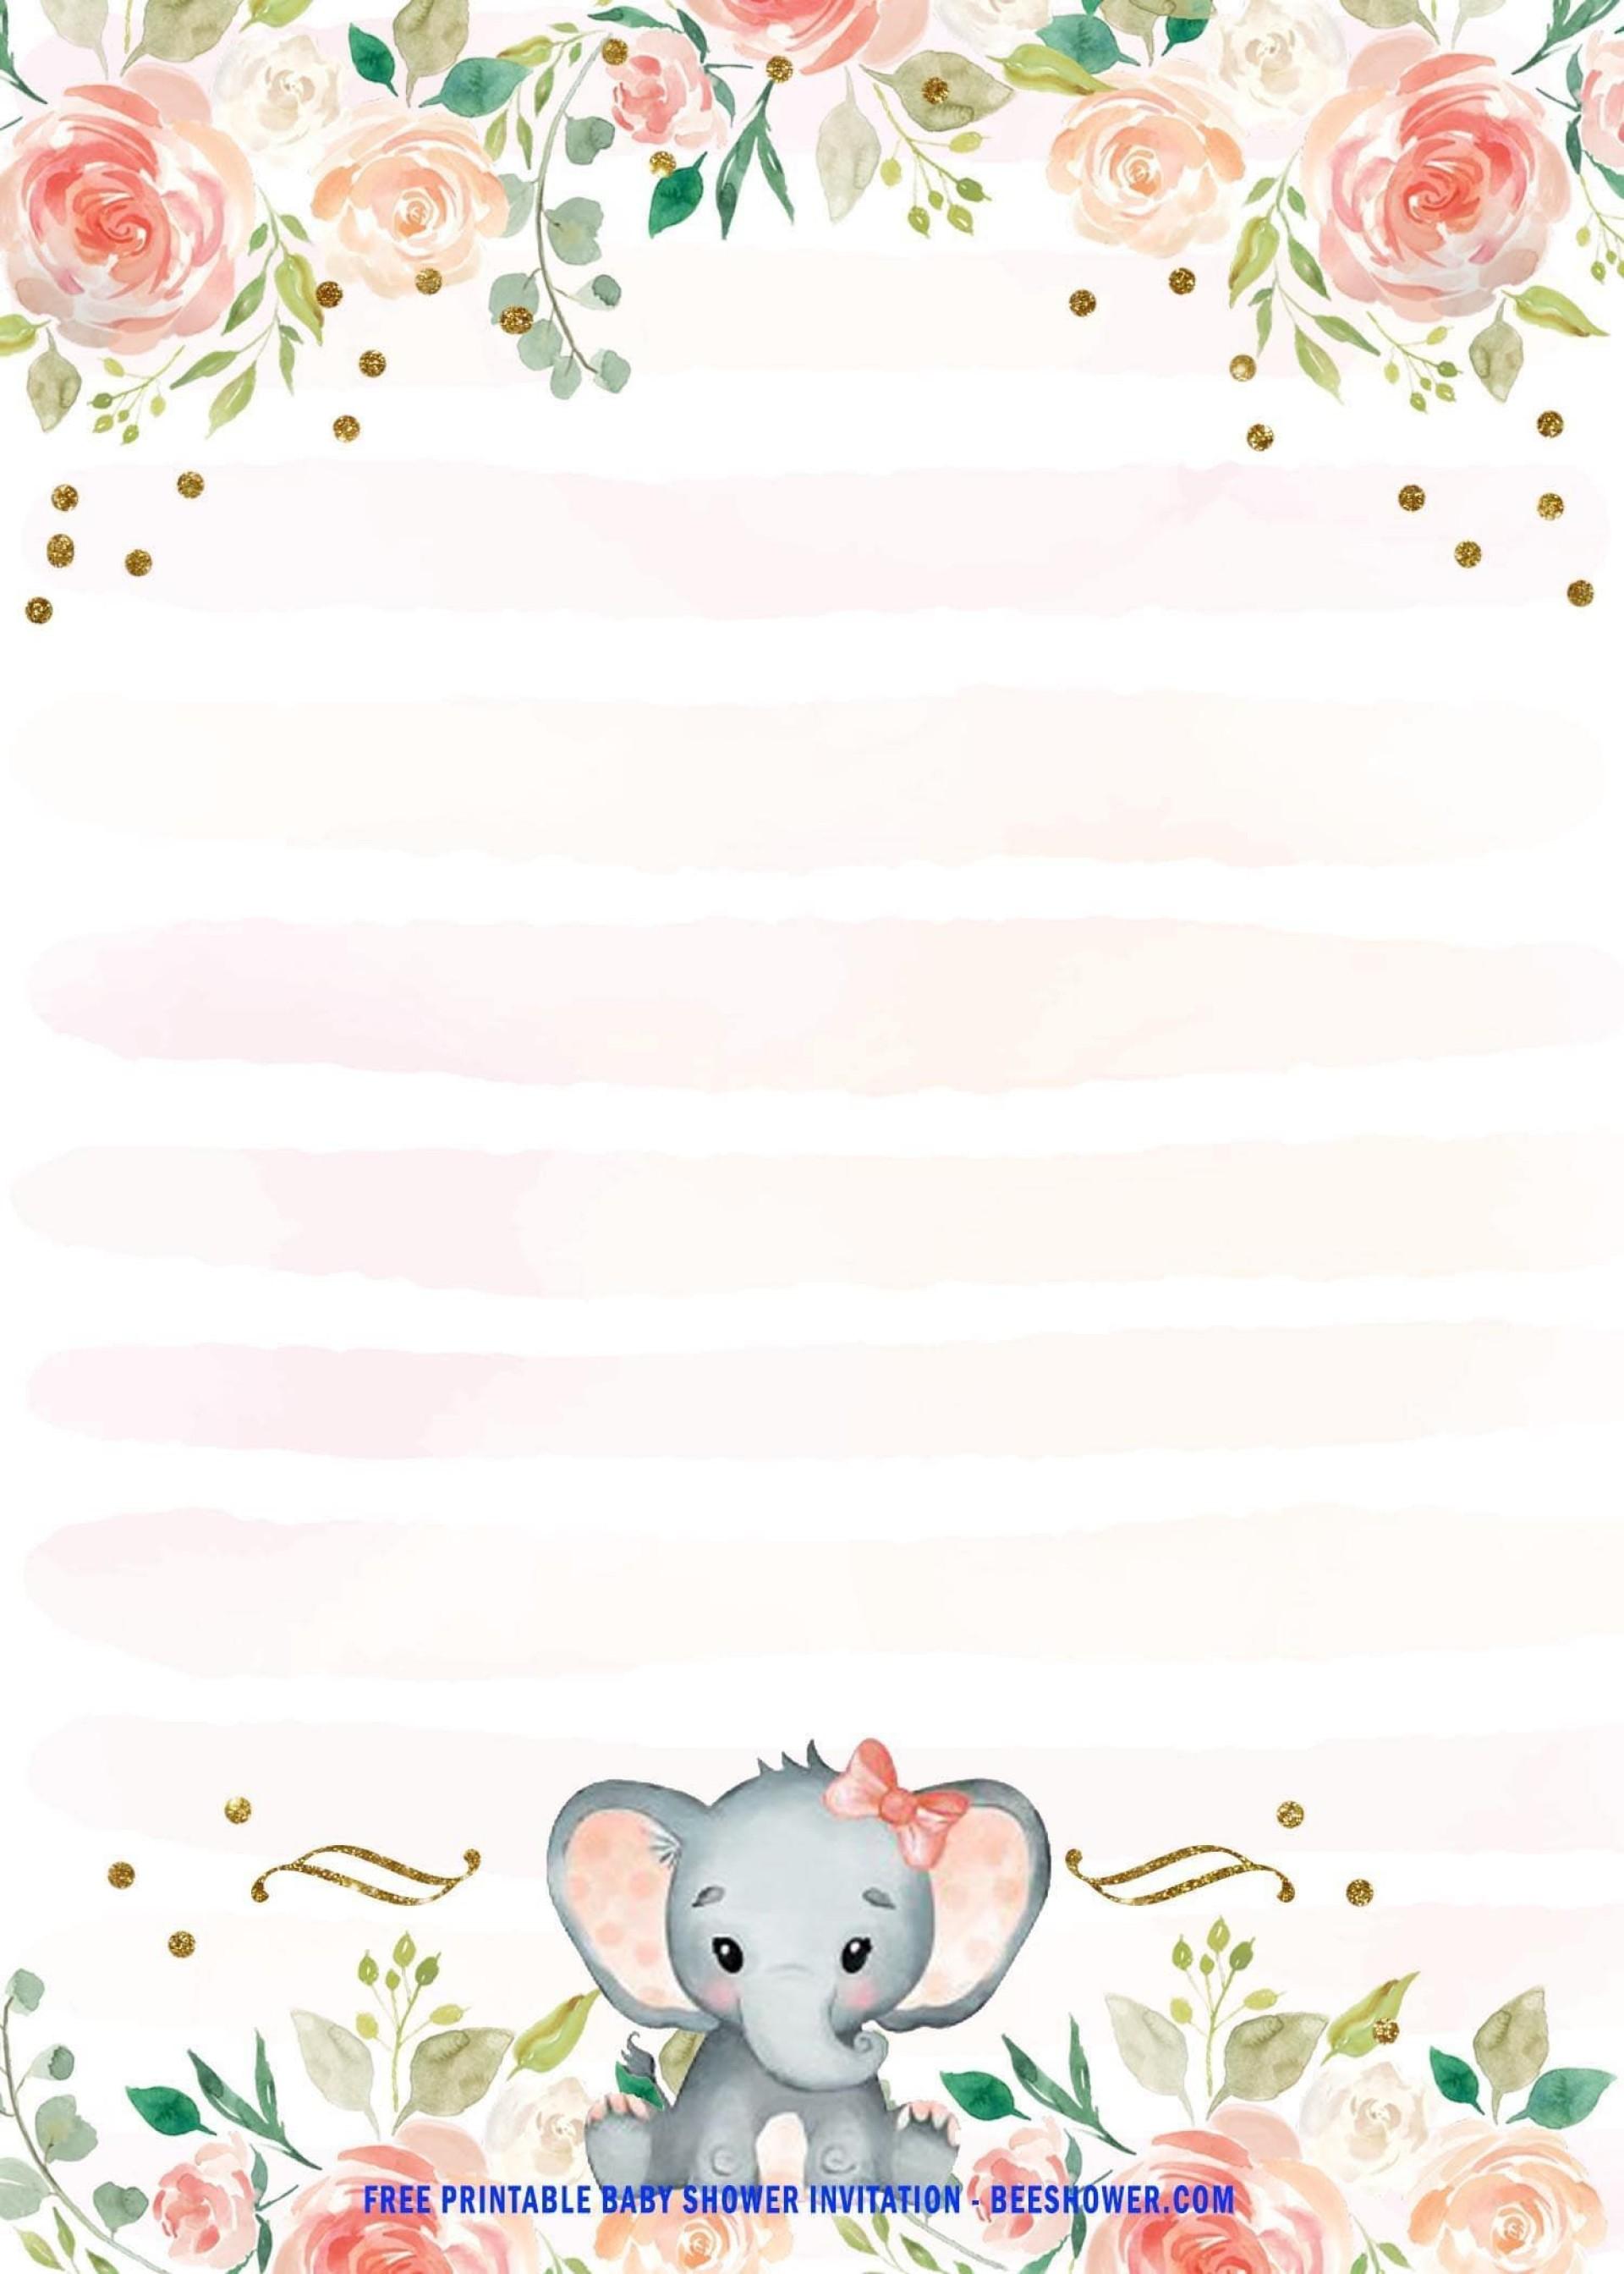 003 Wondrou Elephant Baby Shower Invitation Template Picture  Templates Free Pdf Boy1920